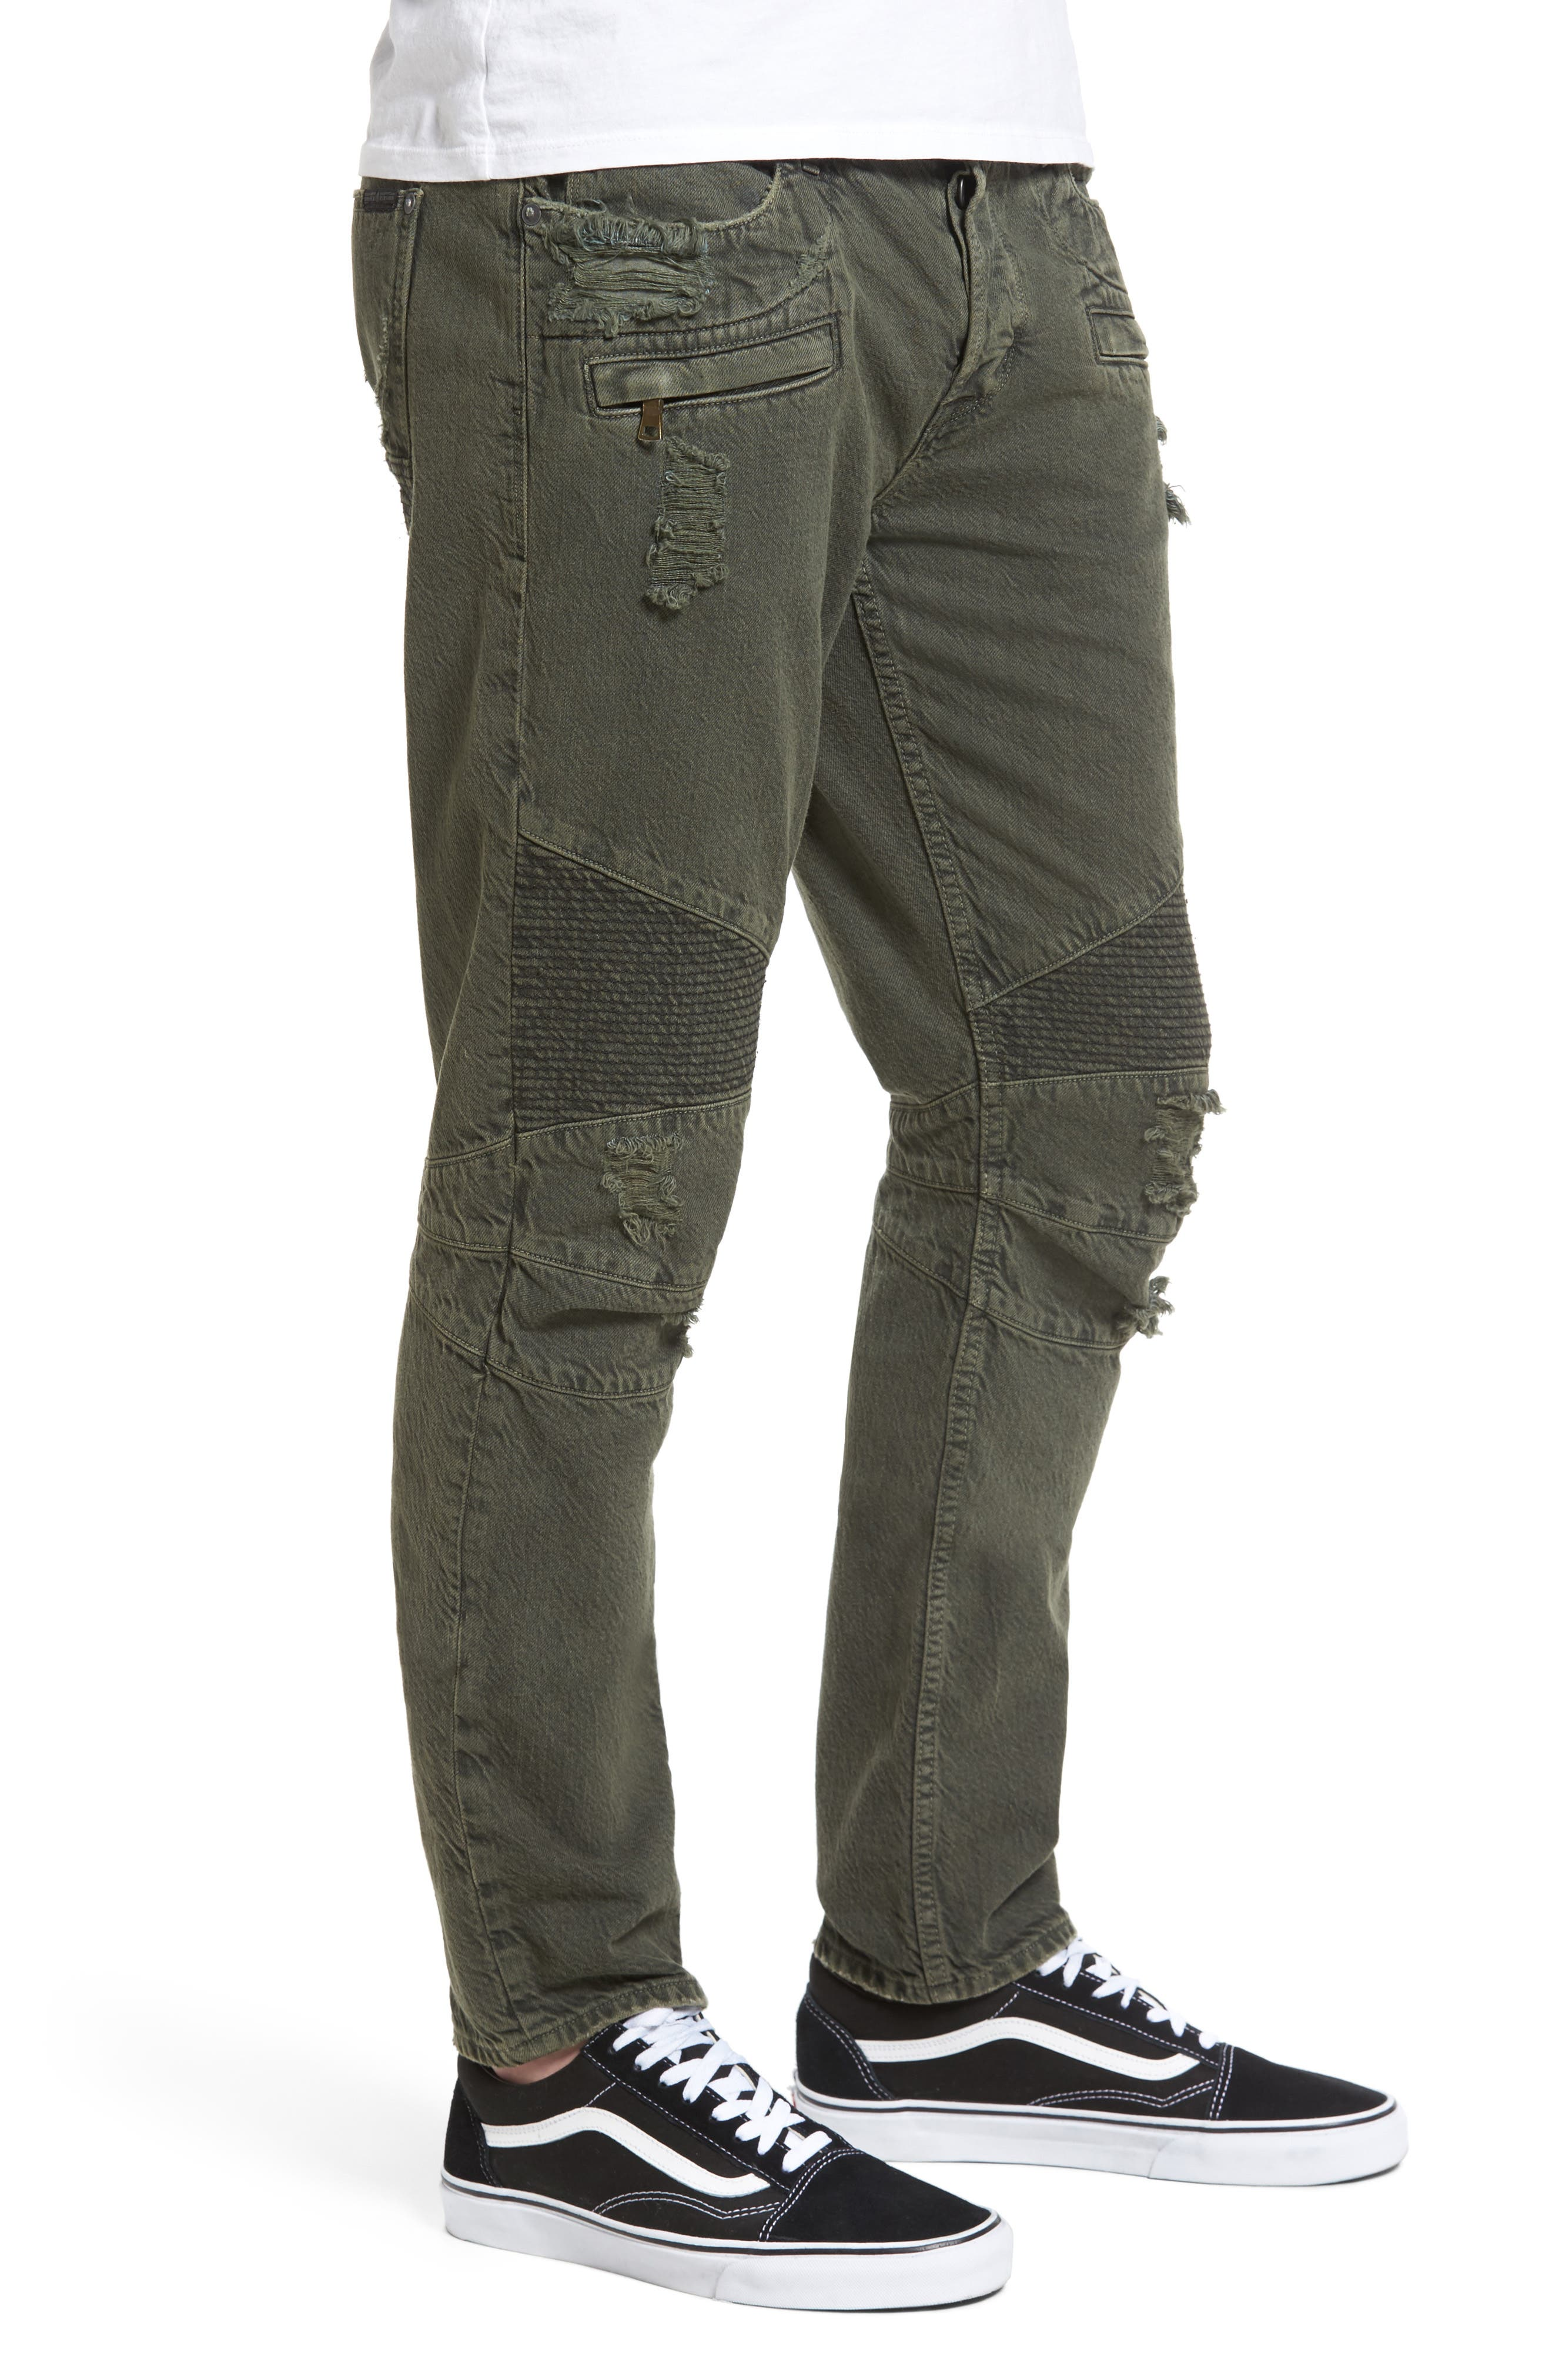 Blinder Biker Skinny Fit Jeans,                             Alternate thumbnail 3, color,                             Fortitude Green